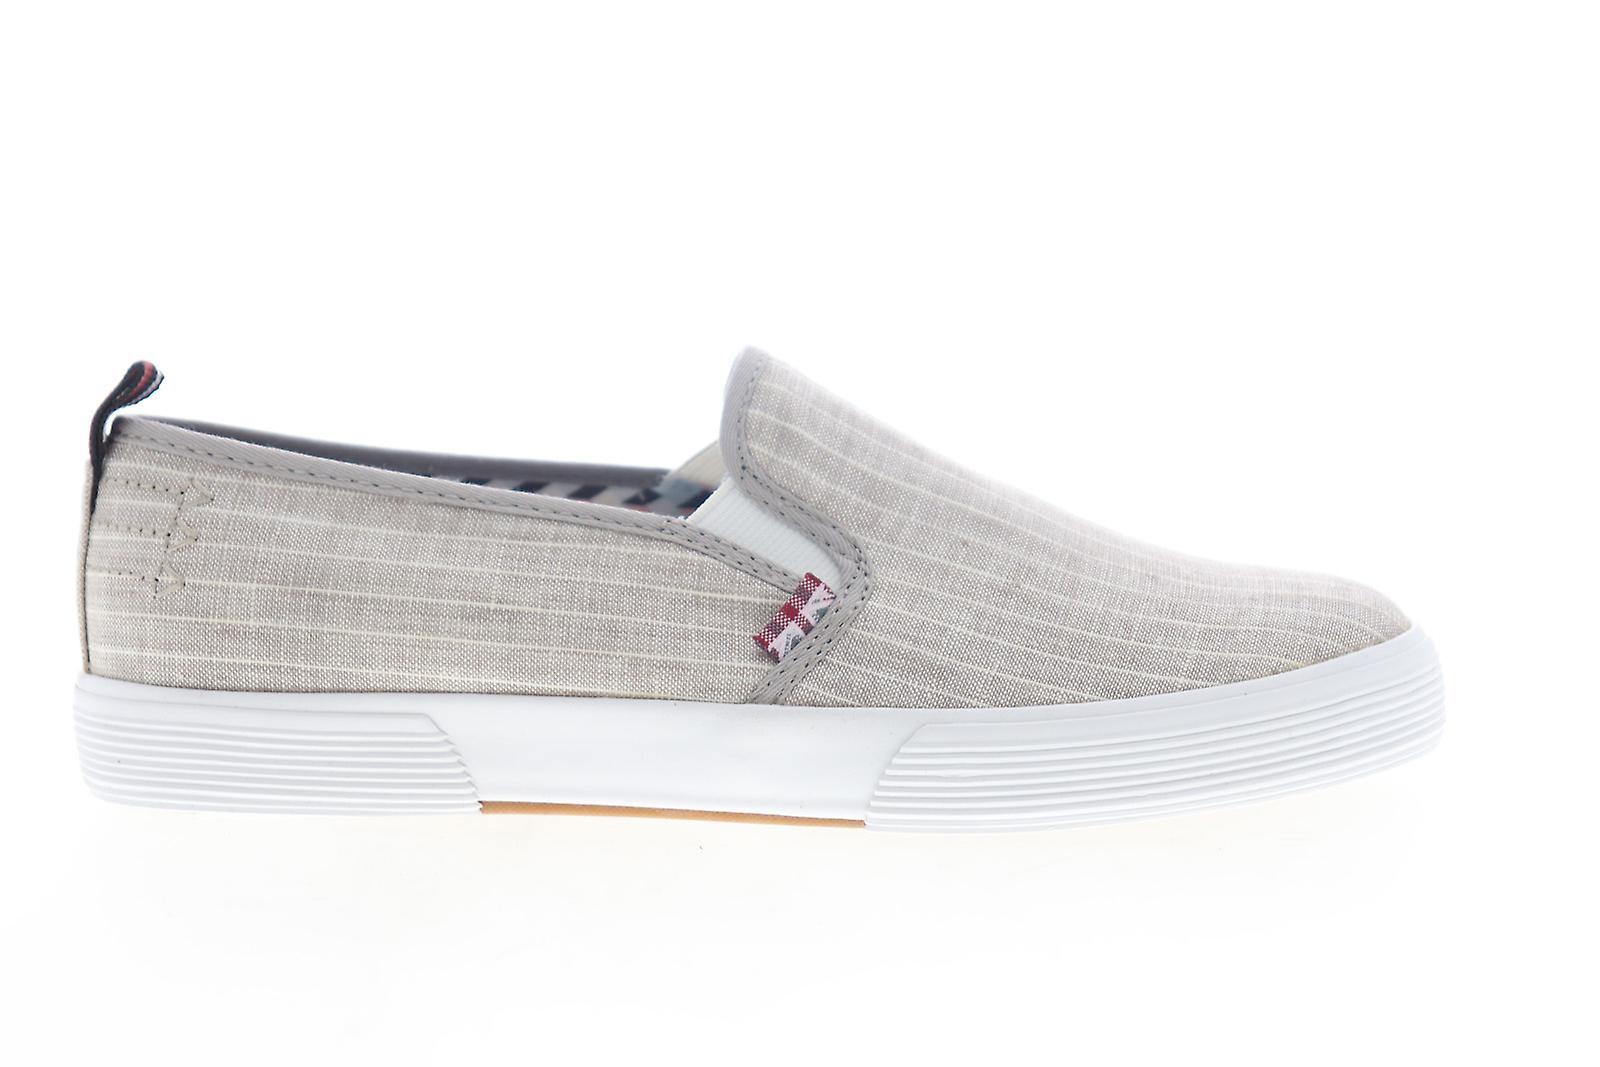 Ben Sherman Bristol Slip On Mens Brown Canvas Sneakers Chaussures